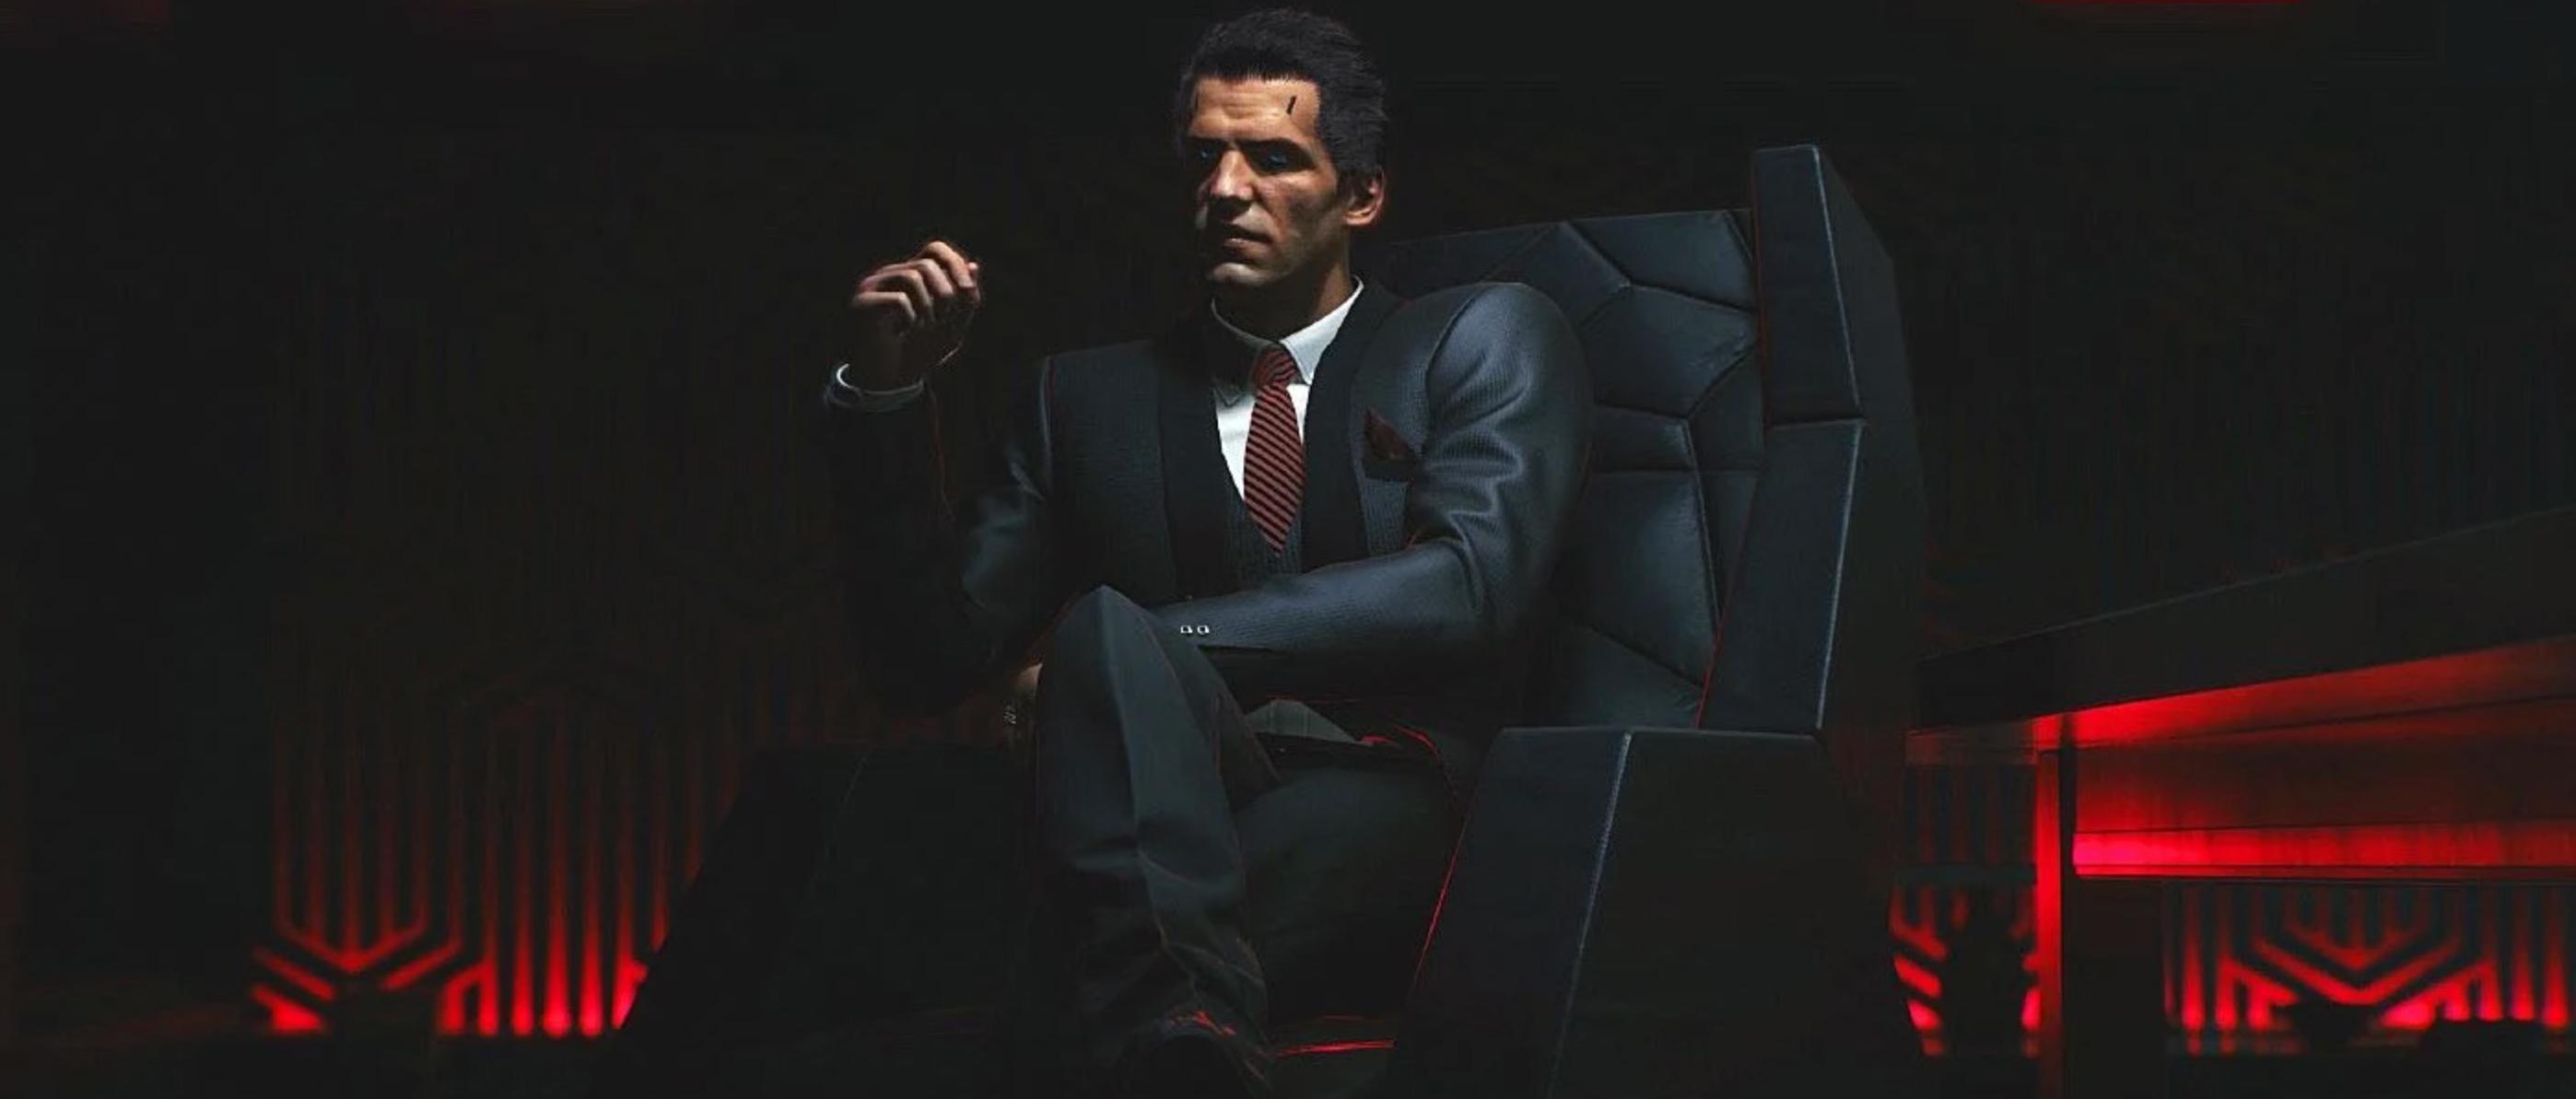 cyberpunk 2077 video game corporations